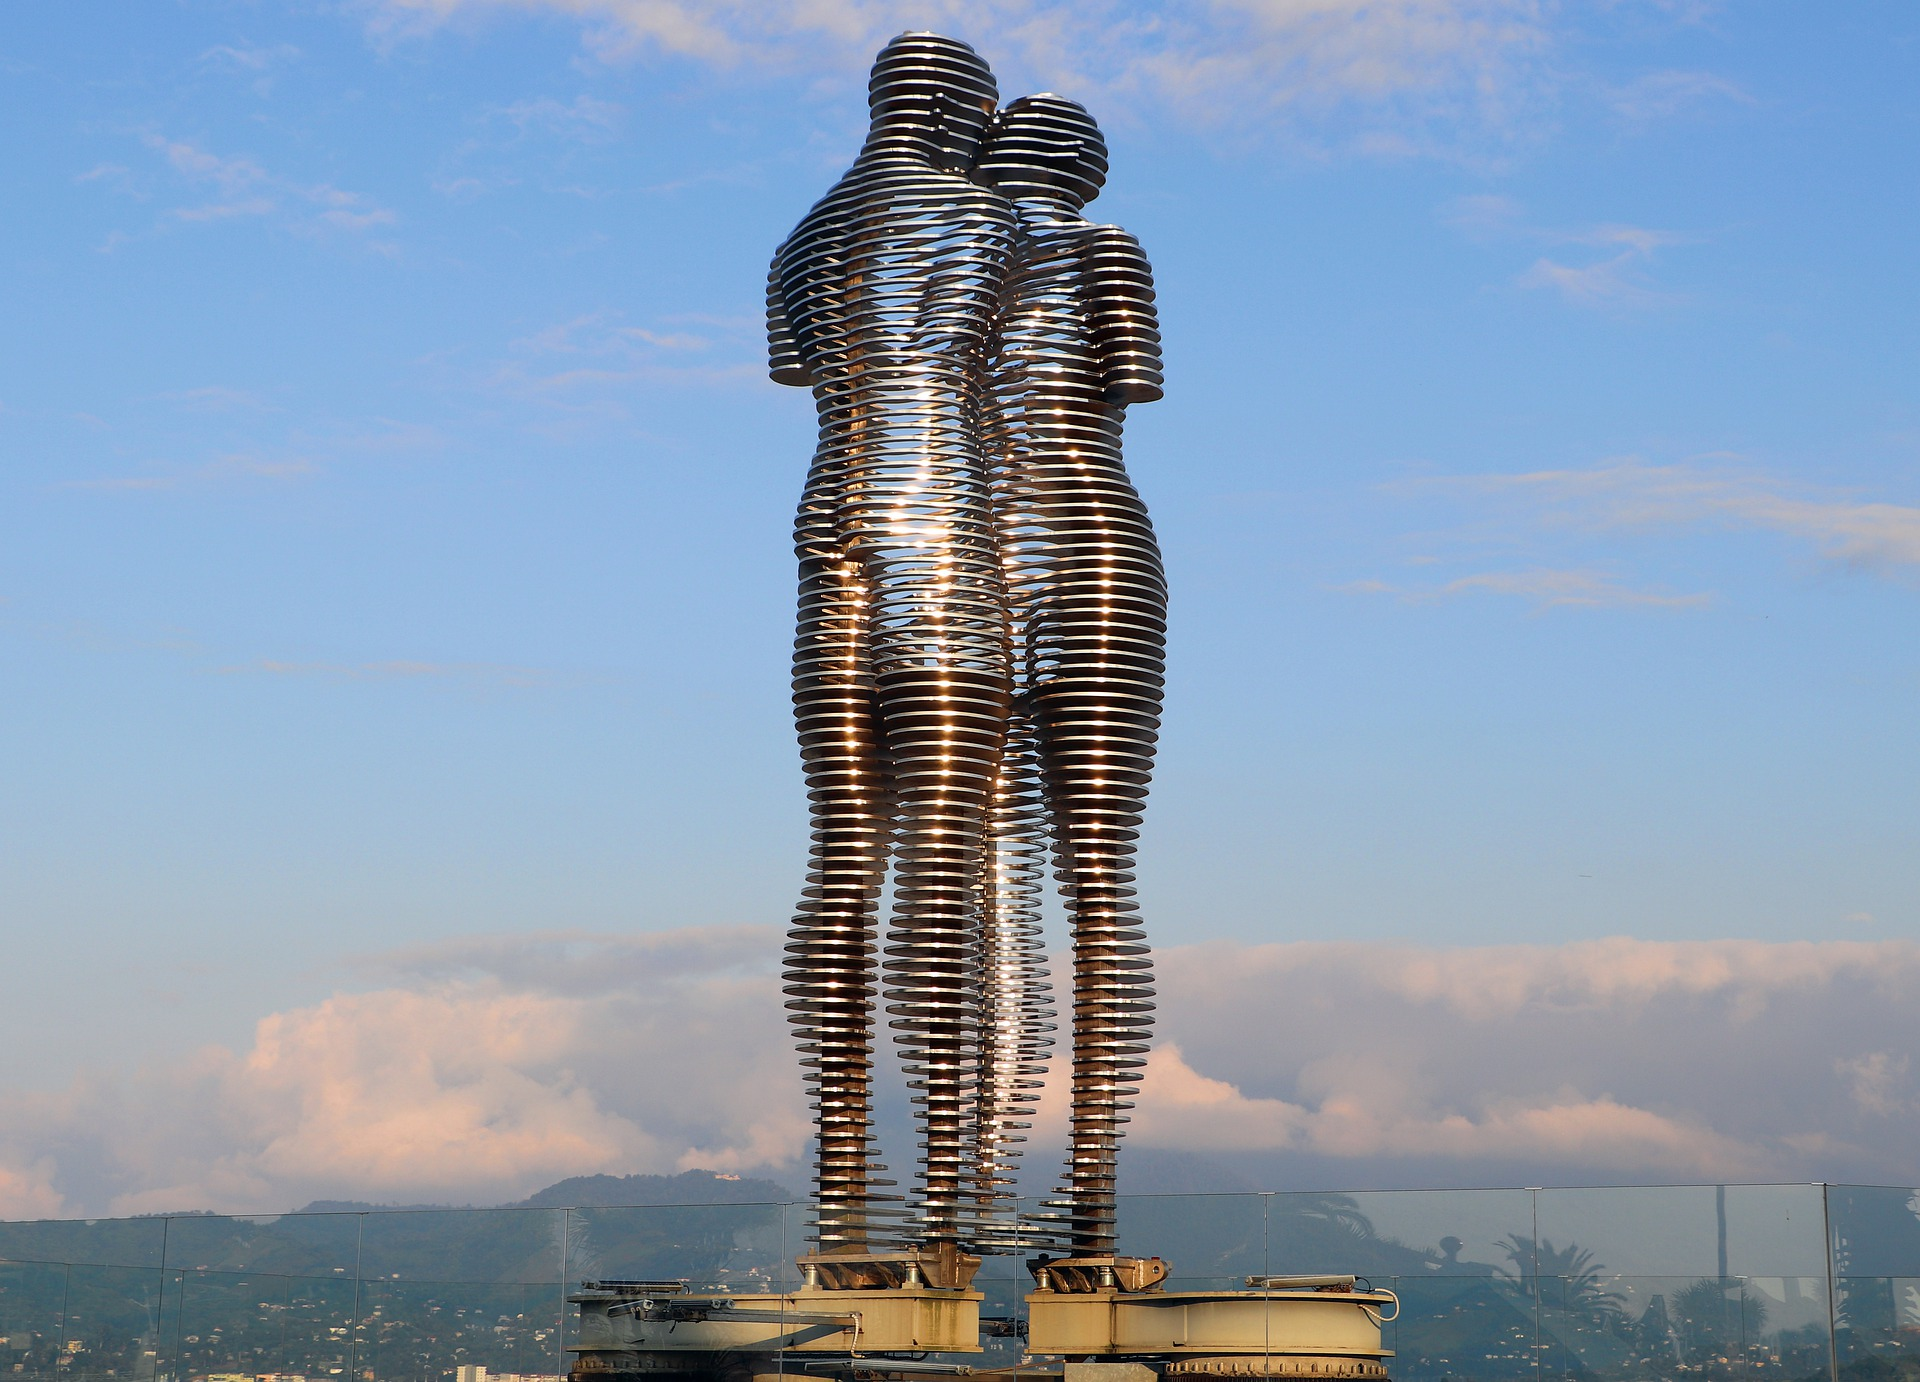 https://www.karpaten-offroad.de/wp-content/uploads/2021/07/Ali-und-Nino-Statue-in-Batumi.jpg